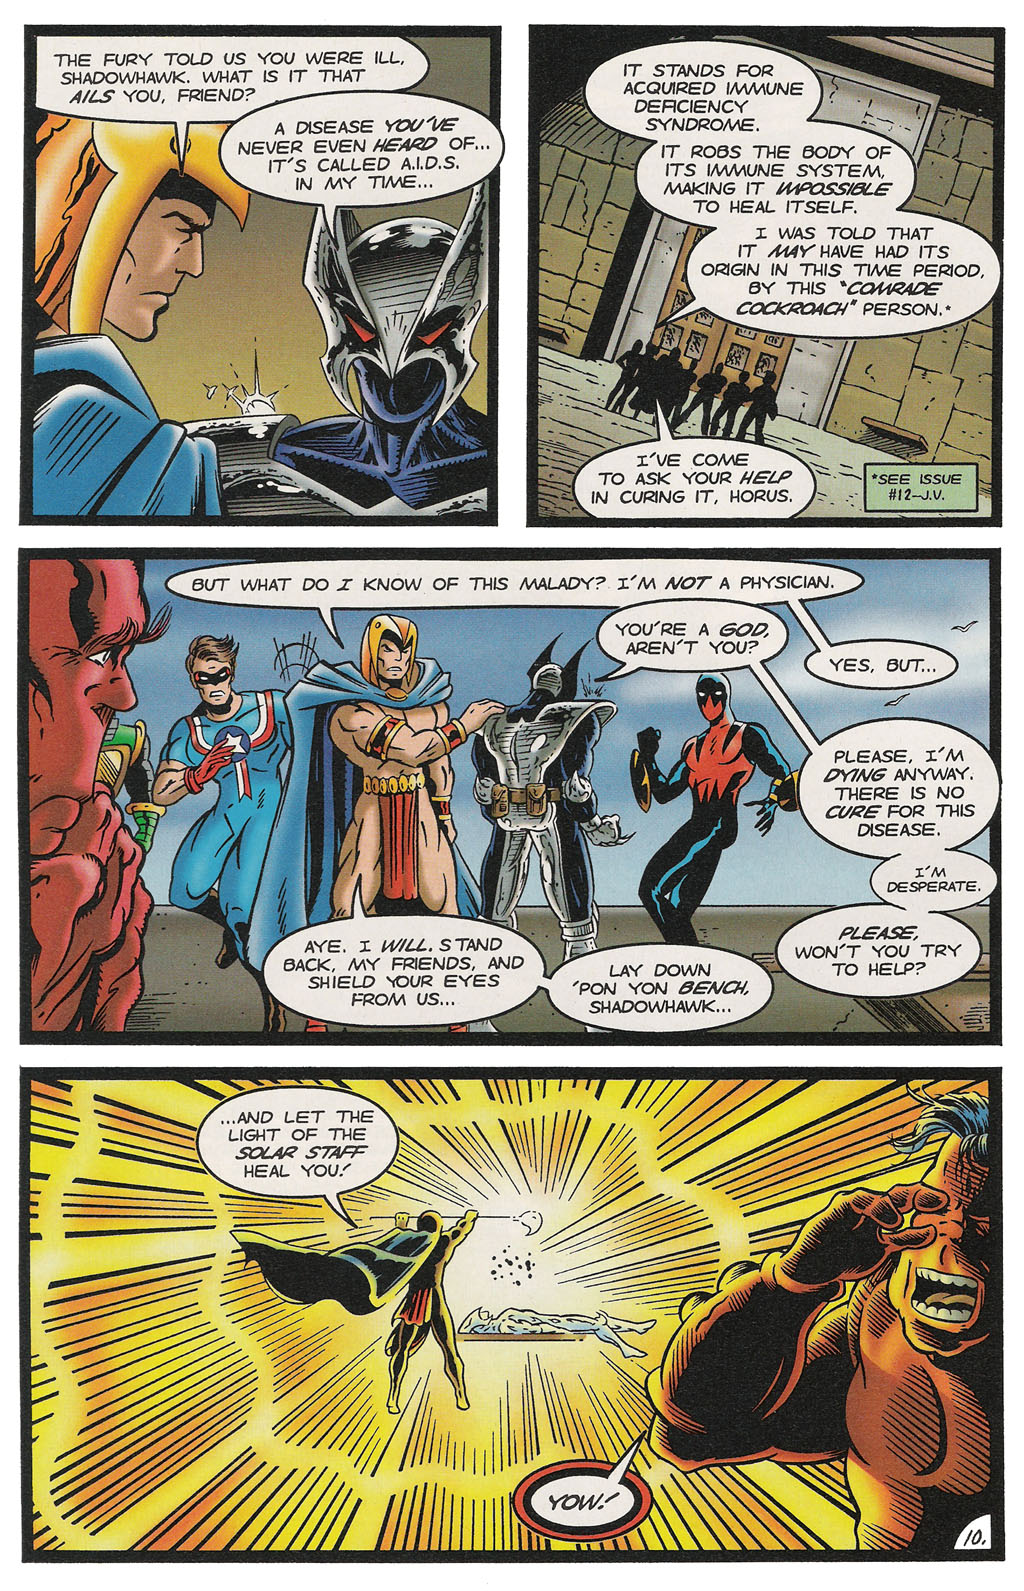 Read online ShadowHawk comic -  Issue #14 - 11